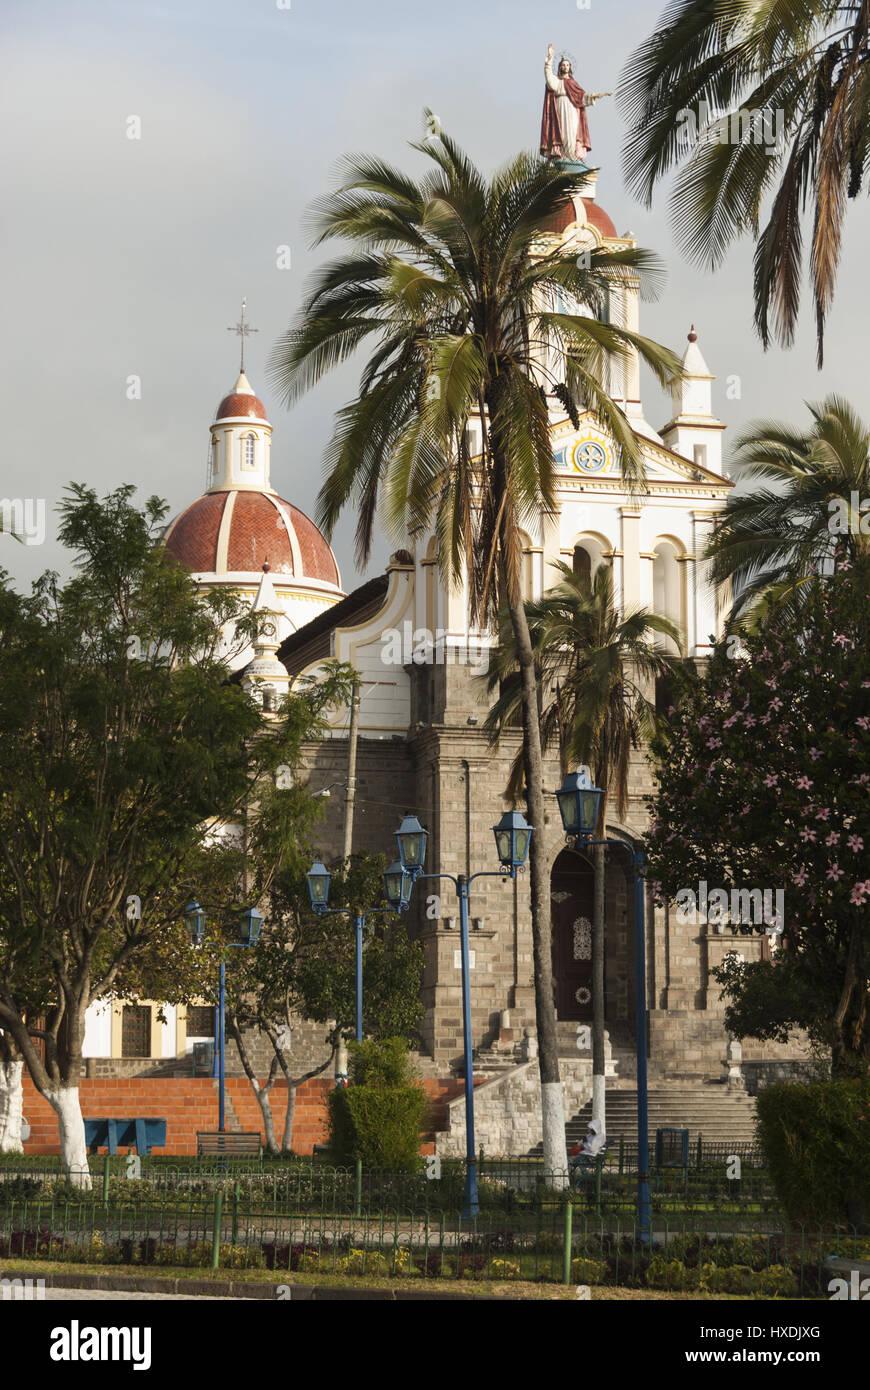 Ecuador, Cotacachi Cotacachi, Plaza, iglesia Imagen De Stock